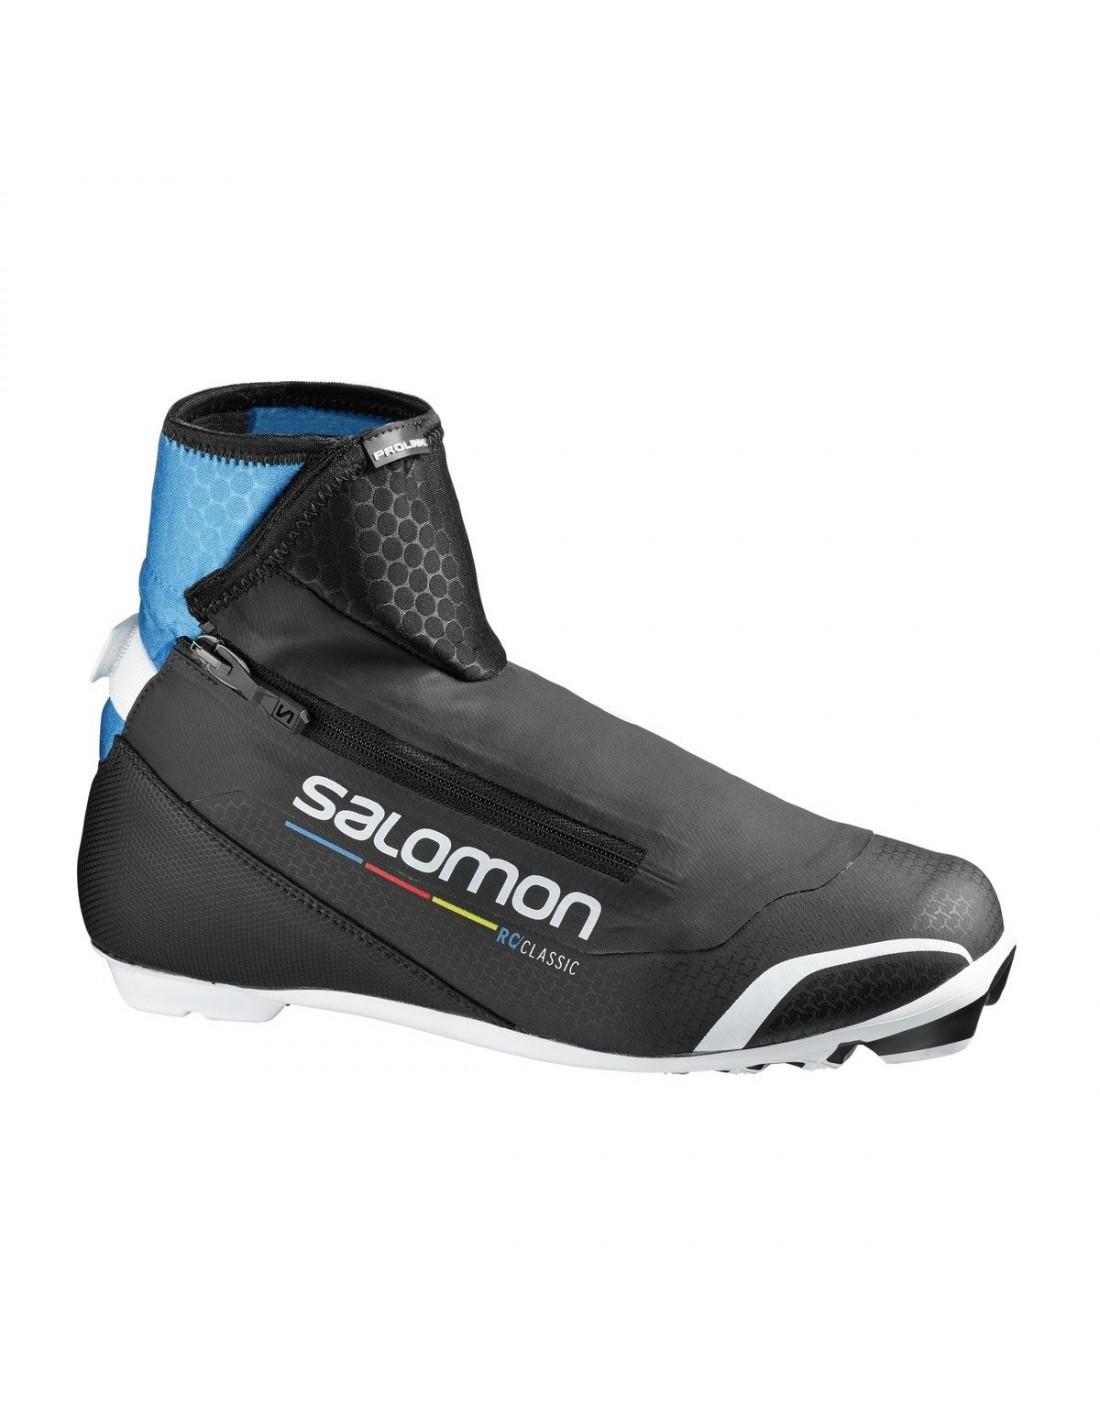 Skisko Voksen Salomon Rc Prolink L40555500 2,799.00